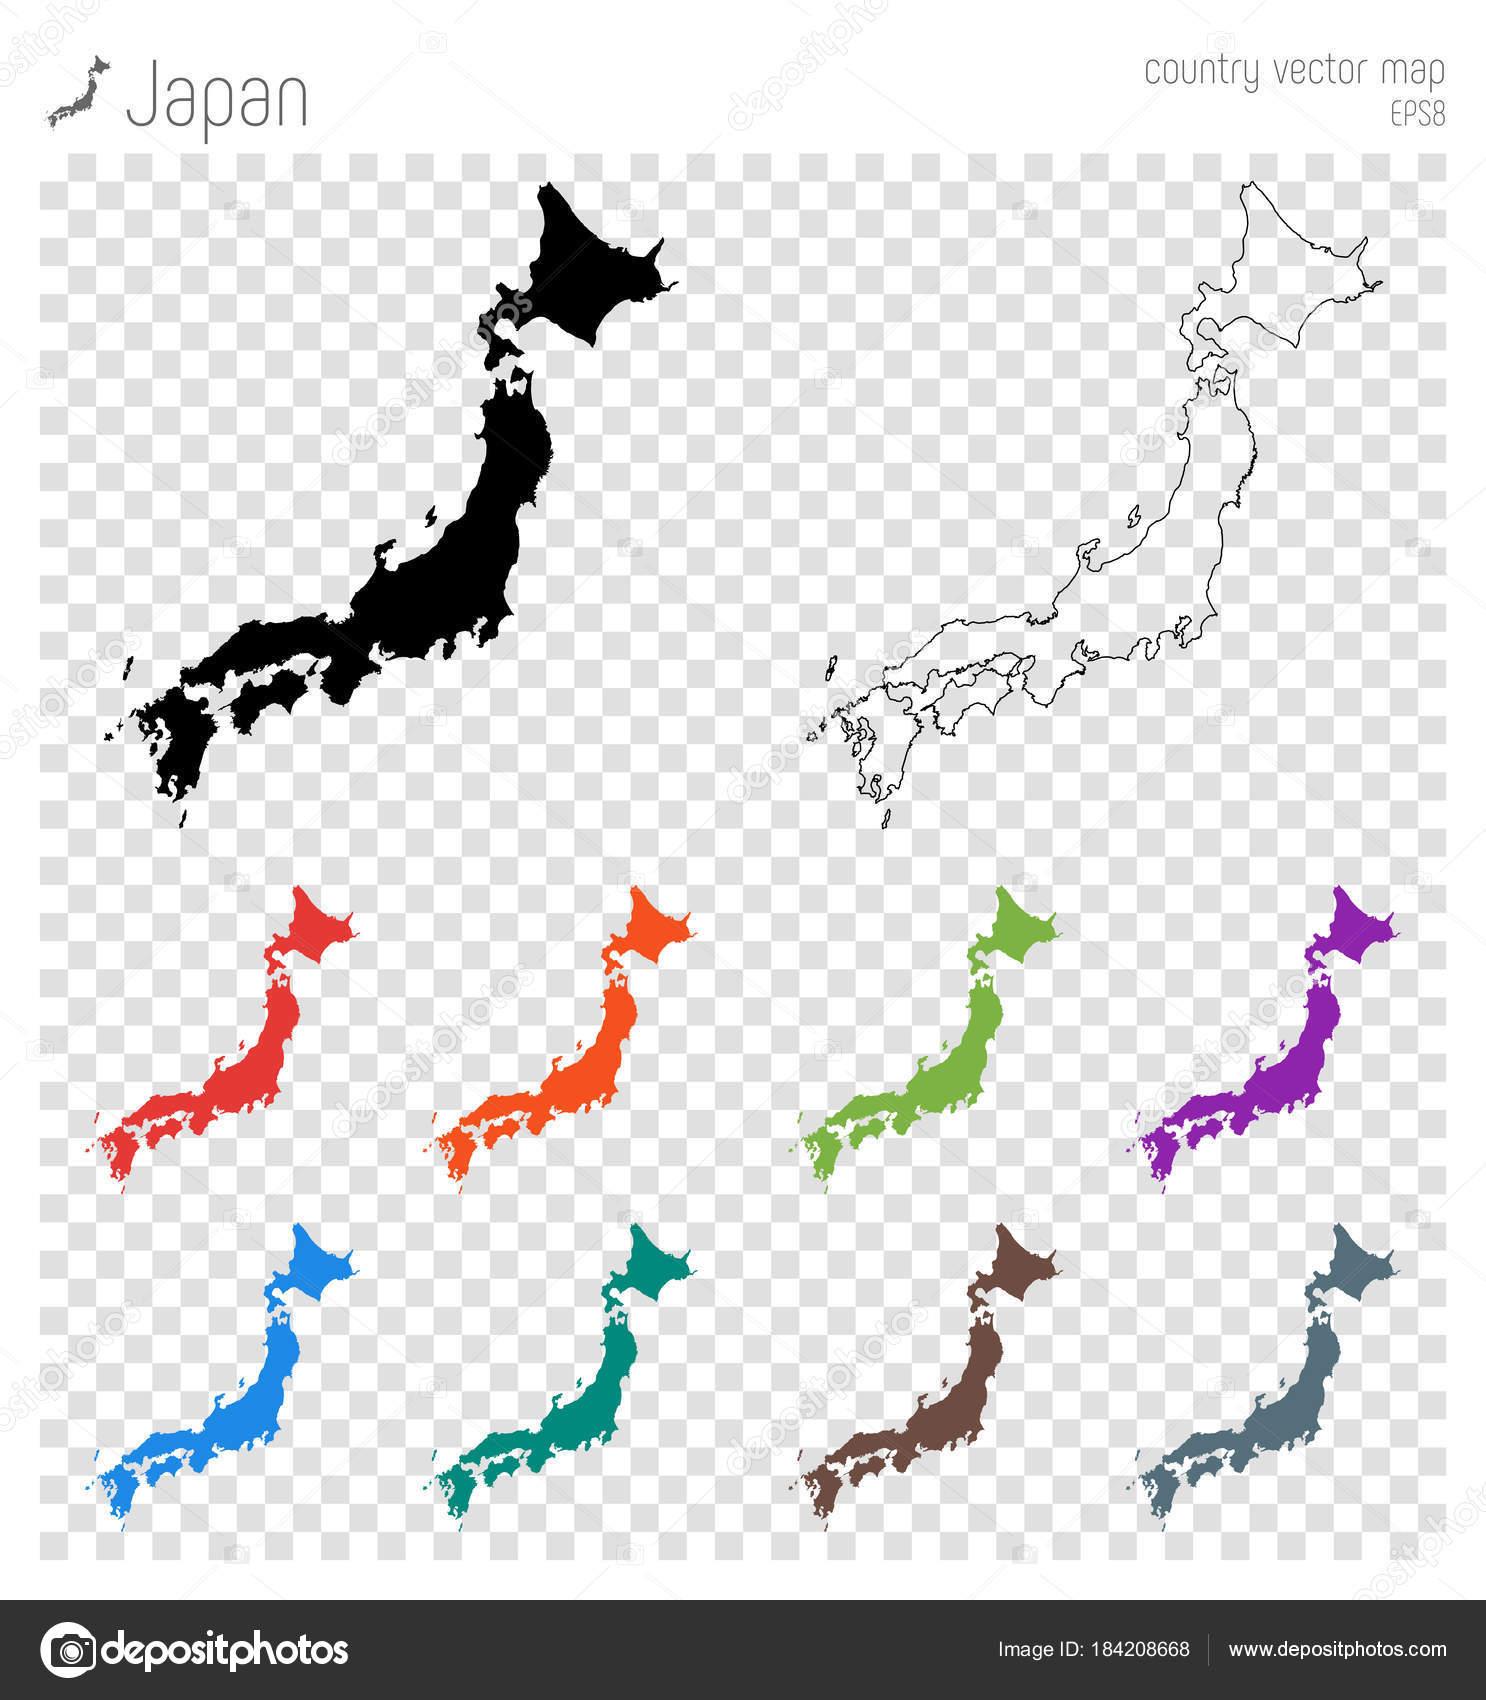 Japan high detailed map Country silhouette icon Isolated Japan black on hyogo japan, yokota japan, winter in japan, kawasaki japan, info about japan, world map japan, languages spoken in japan, hakone japan, kanagawa japan, nikko japan, gifu japan, takayama japan, printable map japan, honshu japan, hiroshima japan, sendai japan, mountains in japan, nagoya japan, hamamatsu japan,